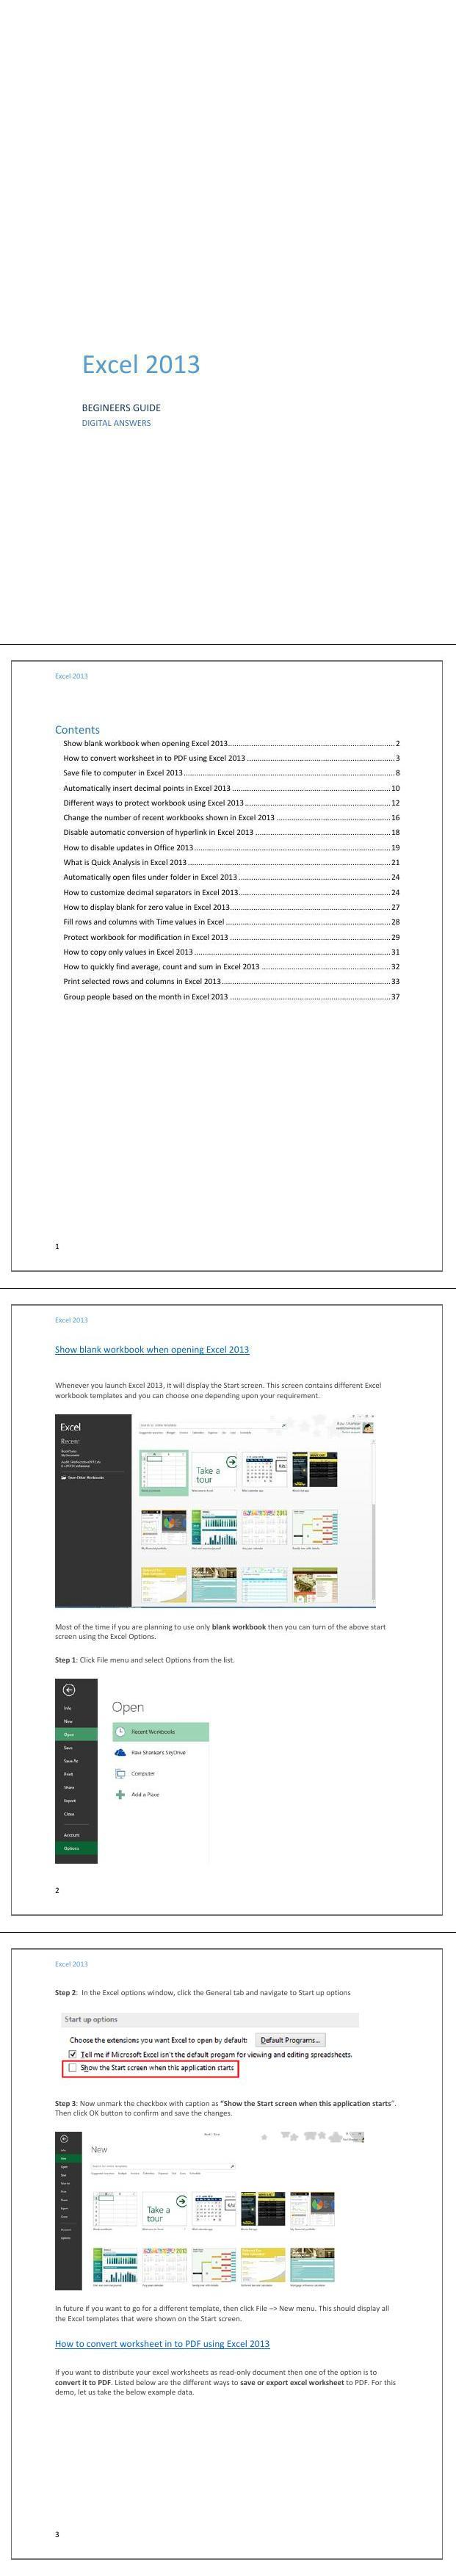 PDF] EXCEL 2013 advanced tutorial workbook - Free PDF Download